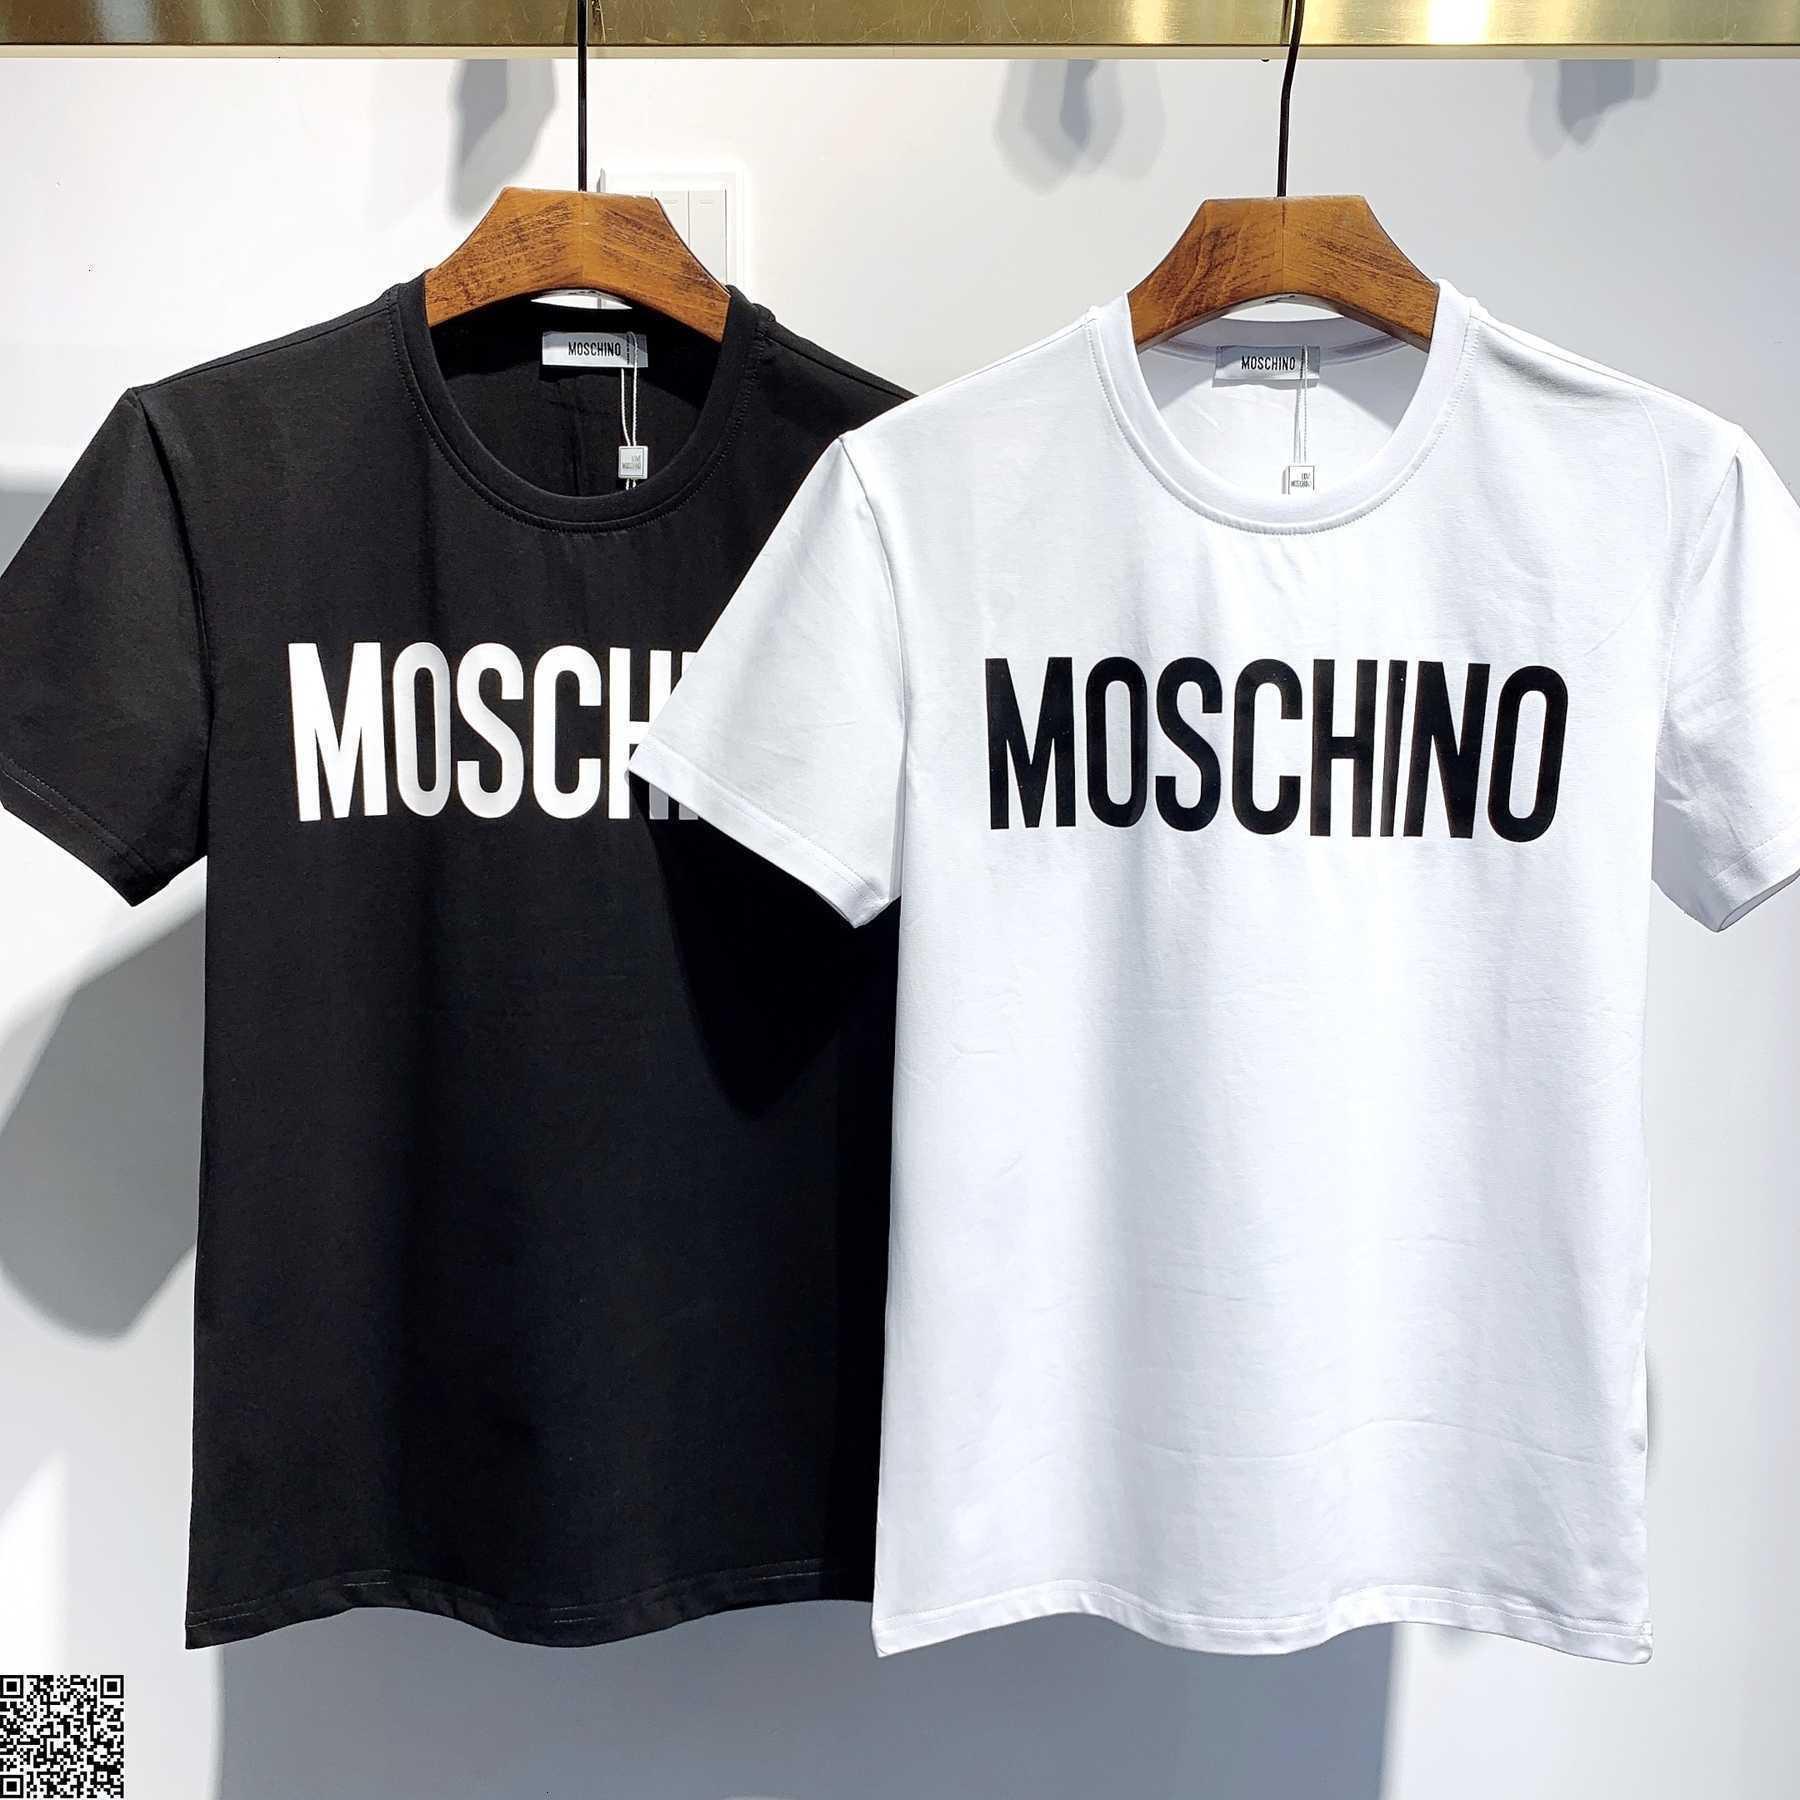 "2020 hombre de la calidad superior t camisa de cuello redondo para hombre ropa de hombre de la camiseta de verano 20191123-K502 # 2151 # ""H118 *"